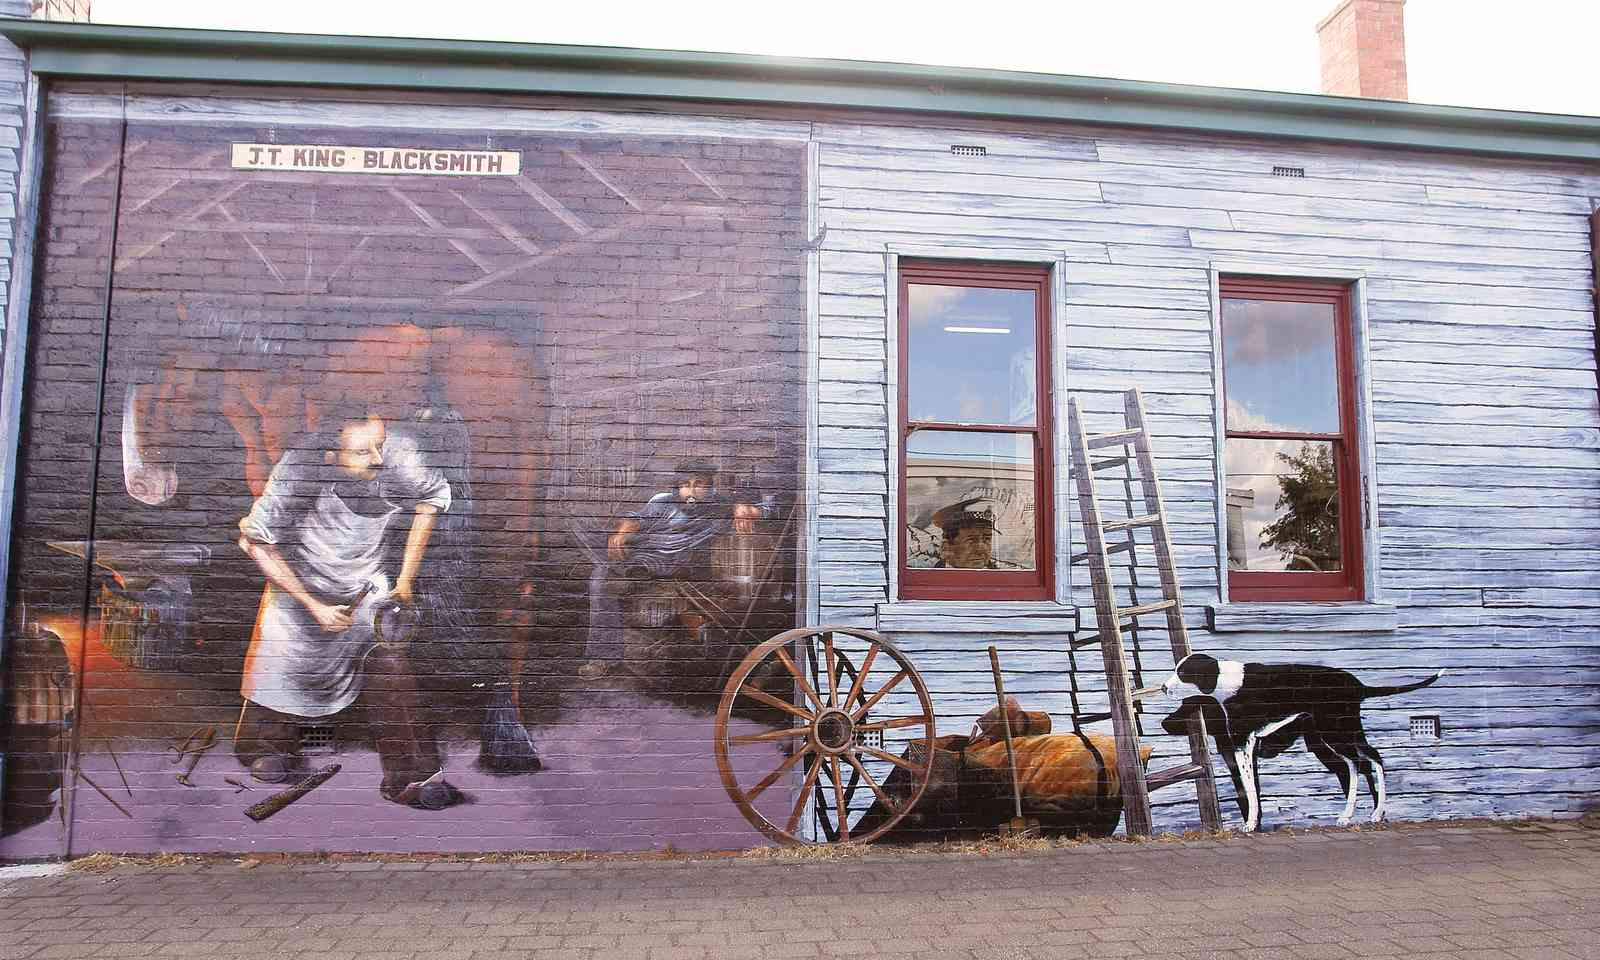 Sheffield, Tasmania (Cradle Mountain Tourist Board)